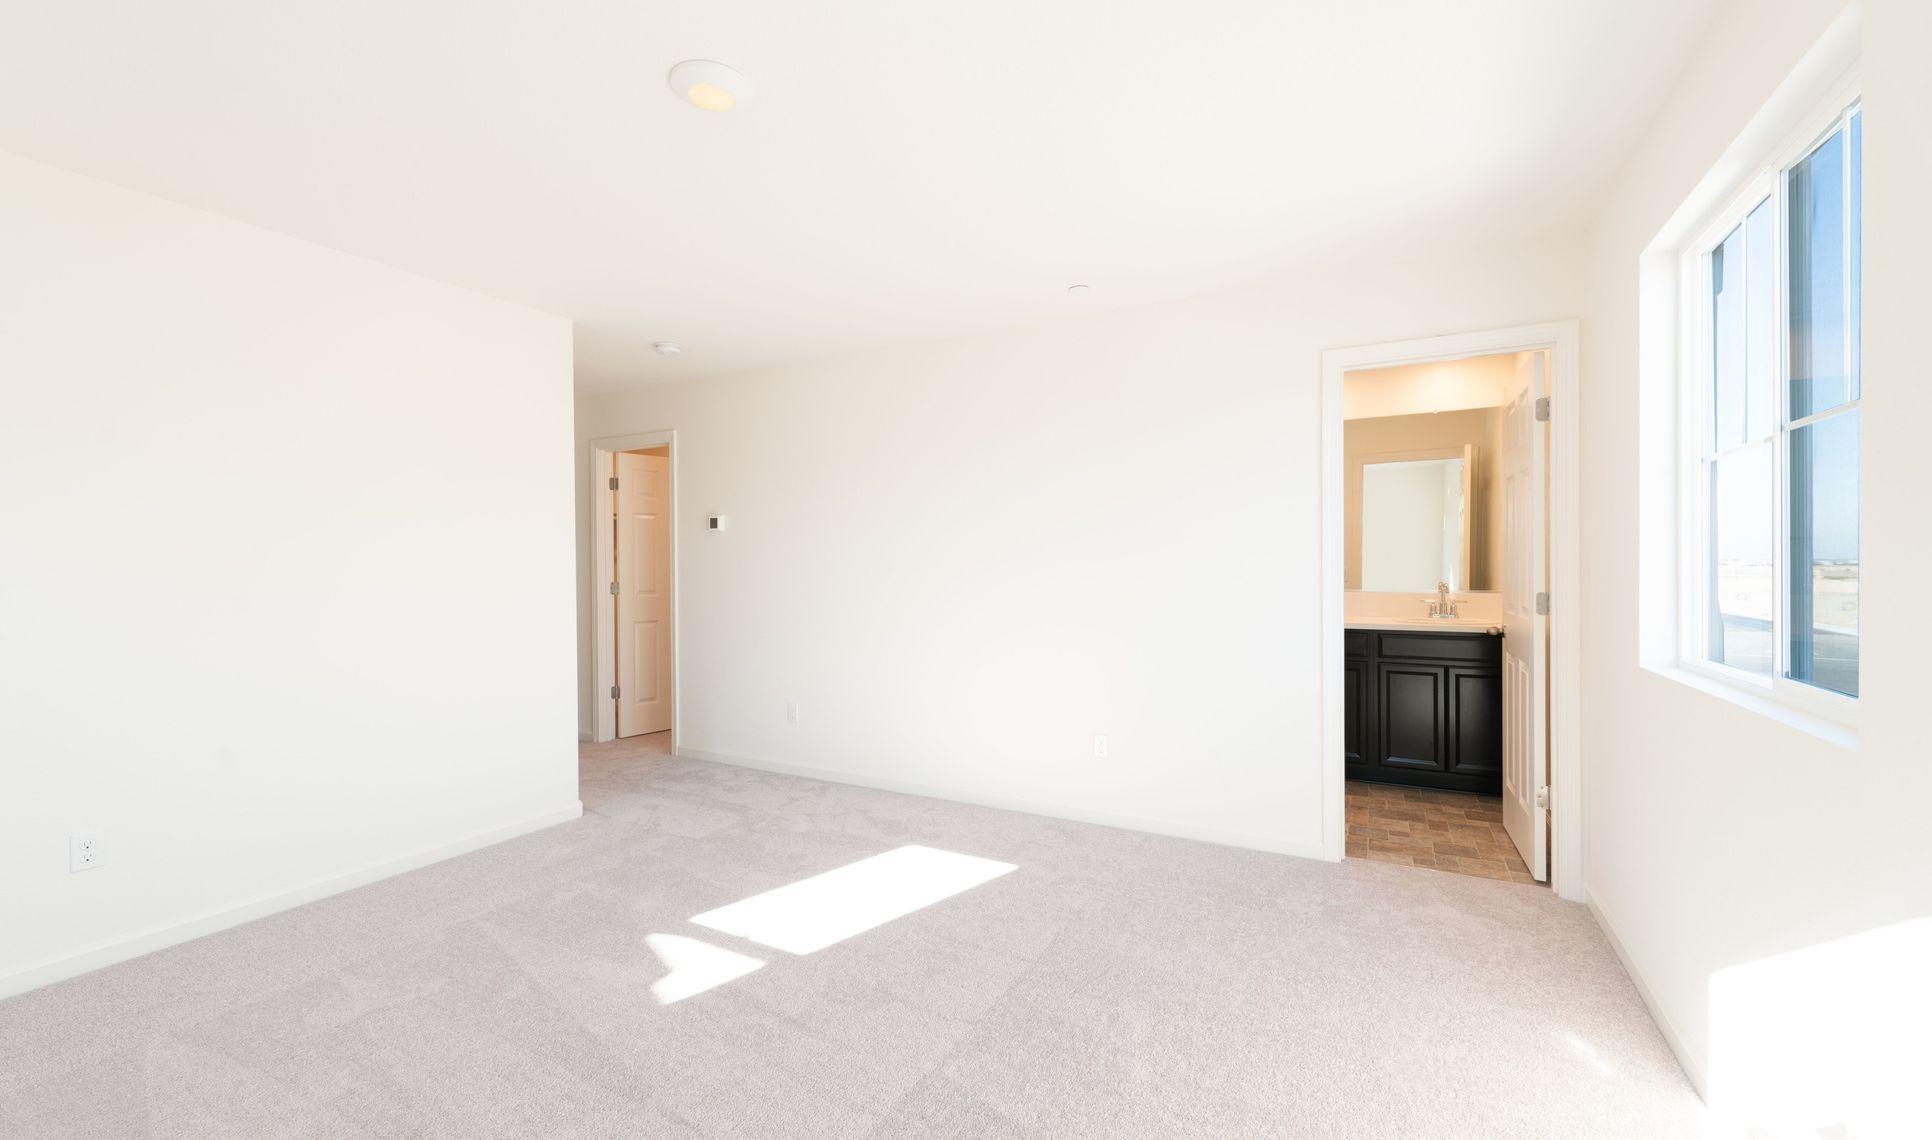 Interior:Retreat-like owner's suite